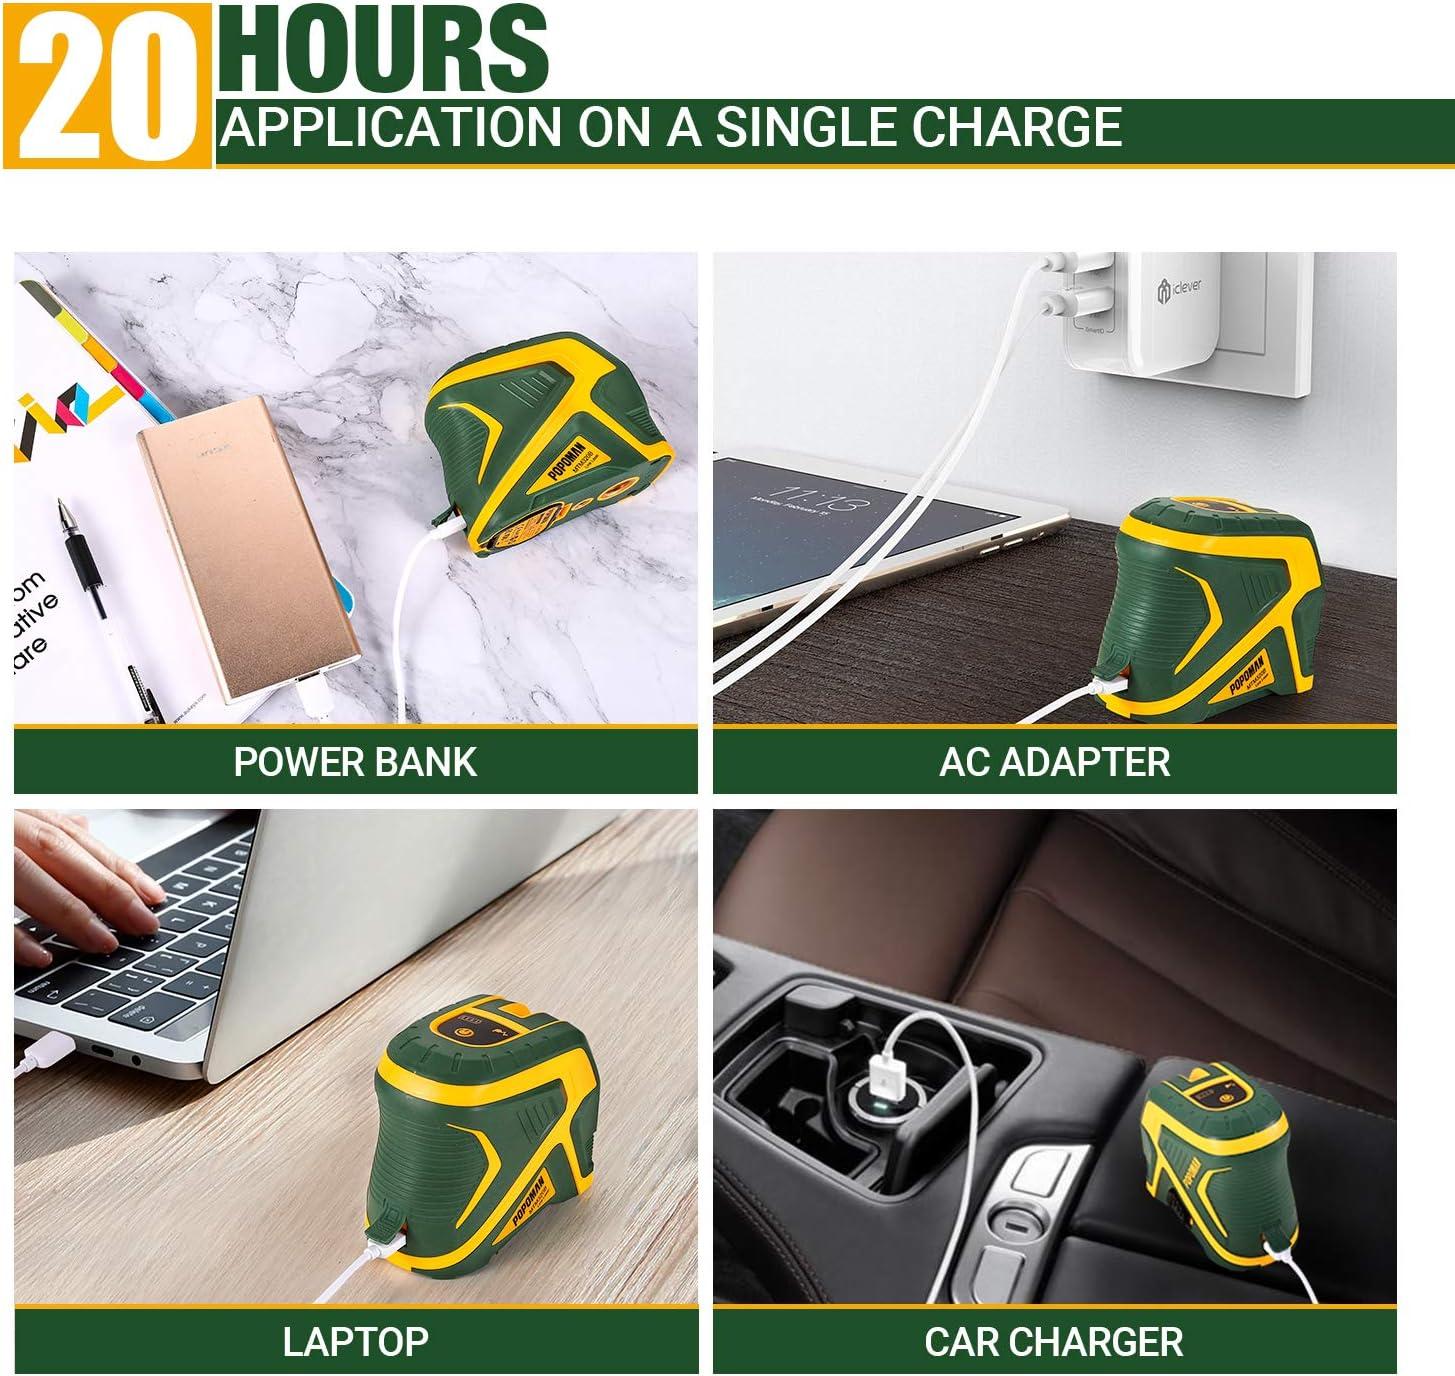 carga USB Nivel l/áser verde bater/ía de litio autonivelante con funci/ón de pulso 25m estuche protector-MTM320B 2 Puntos POPOMAN L/ínea l/áser Cruzada rotaci/ón de 360 /° soporte magn/ético IP54